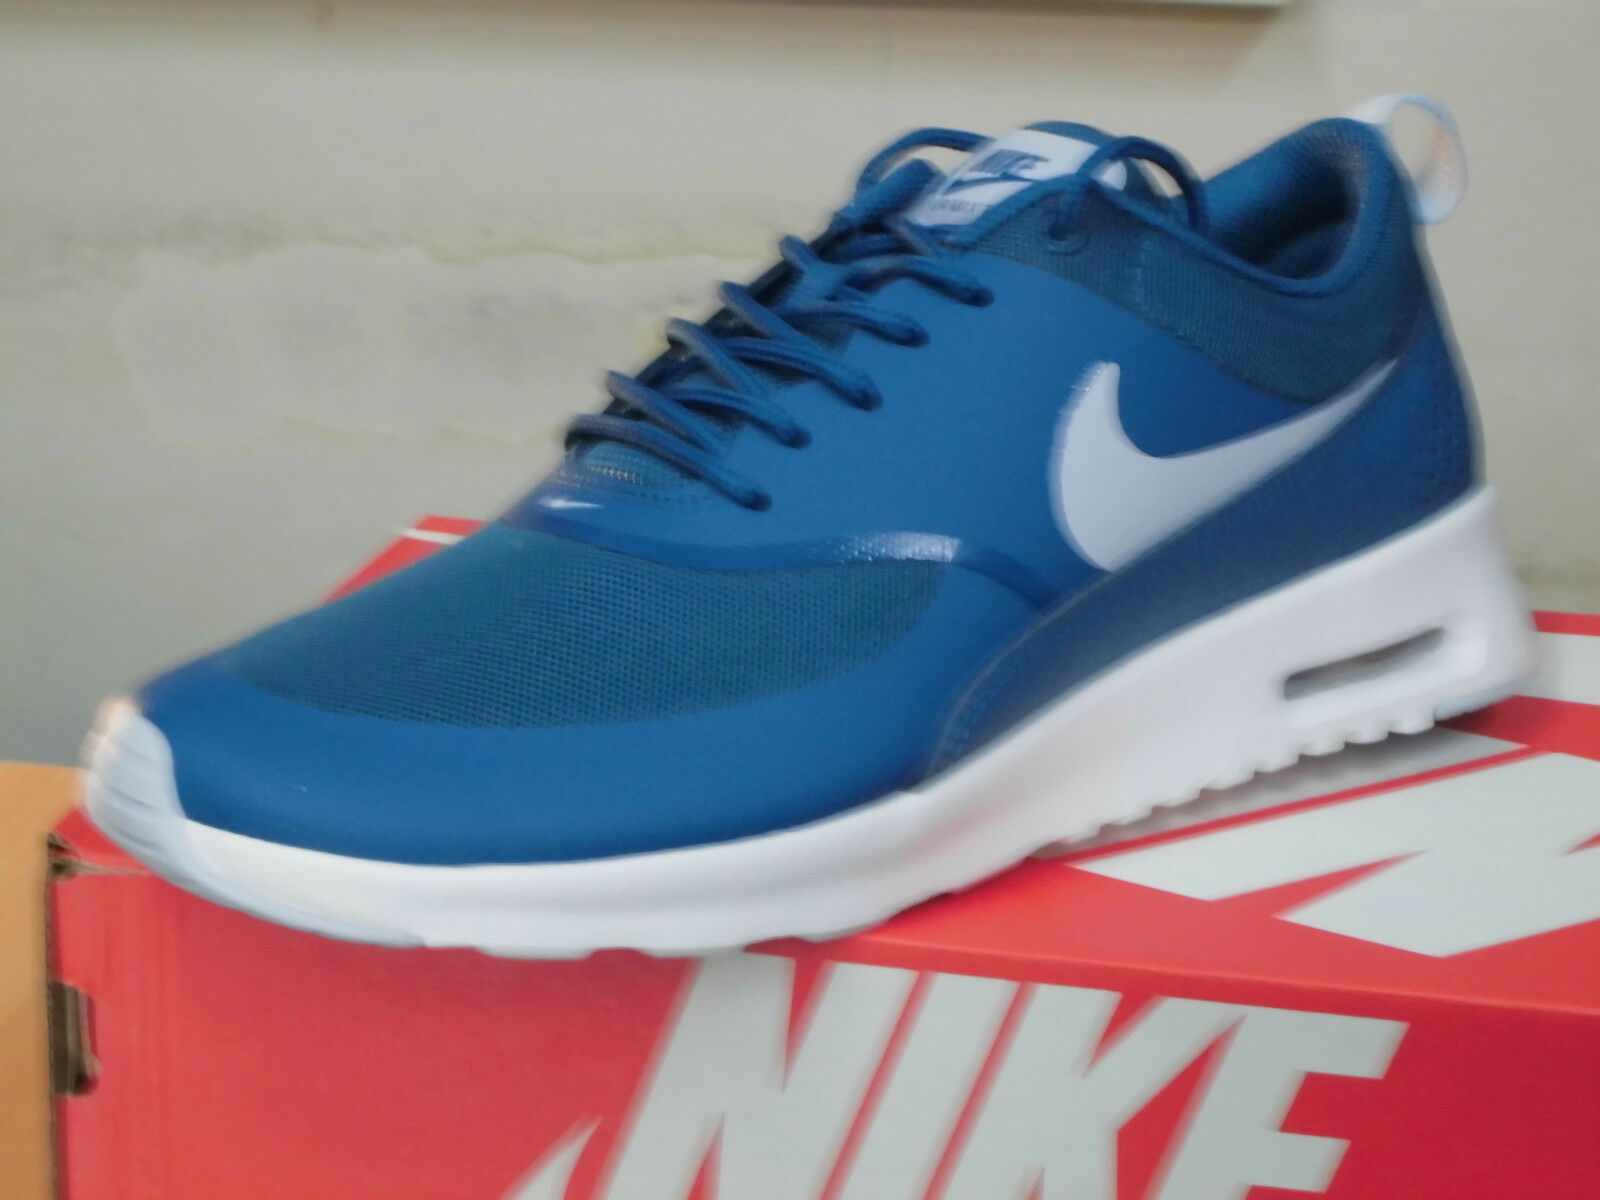 NIKE AIR MAX  THEA, DAMEN/ DAMEN/ DAMEN/ WMNS  SPORT SCHUHE. Style, Original Nike. 185ab7